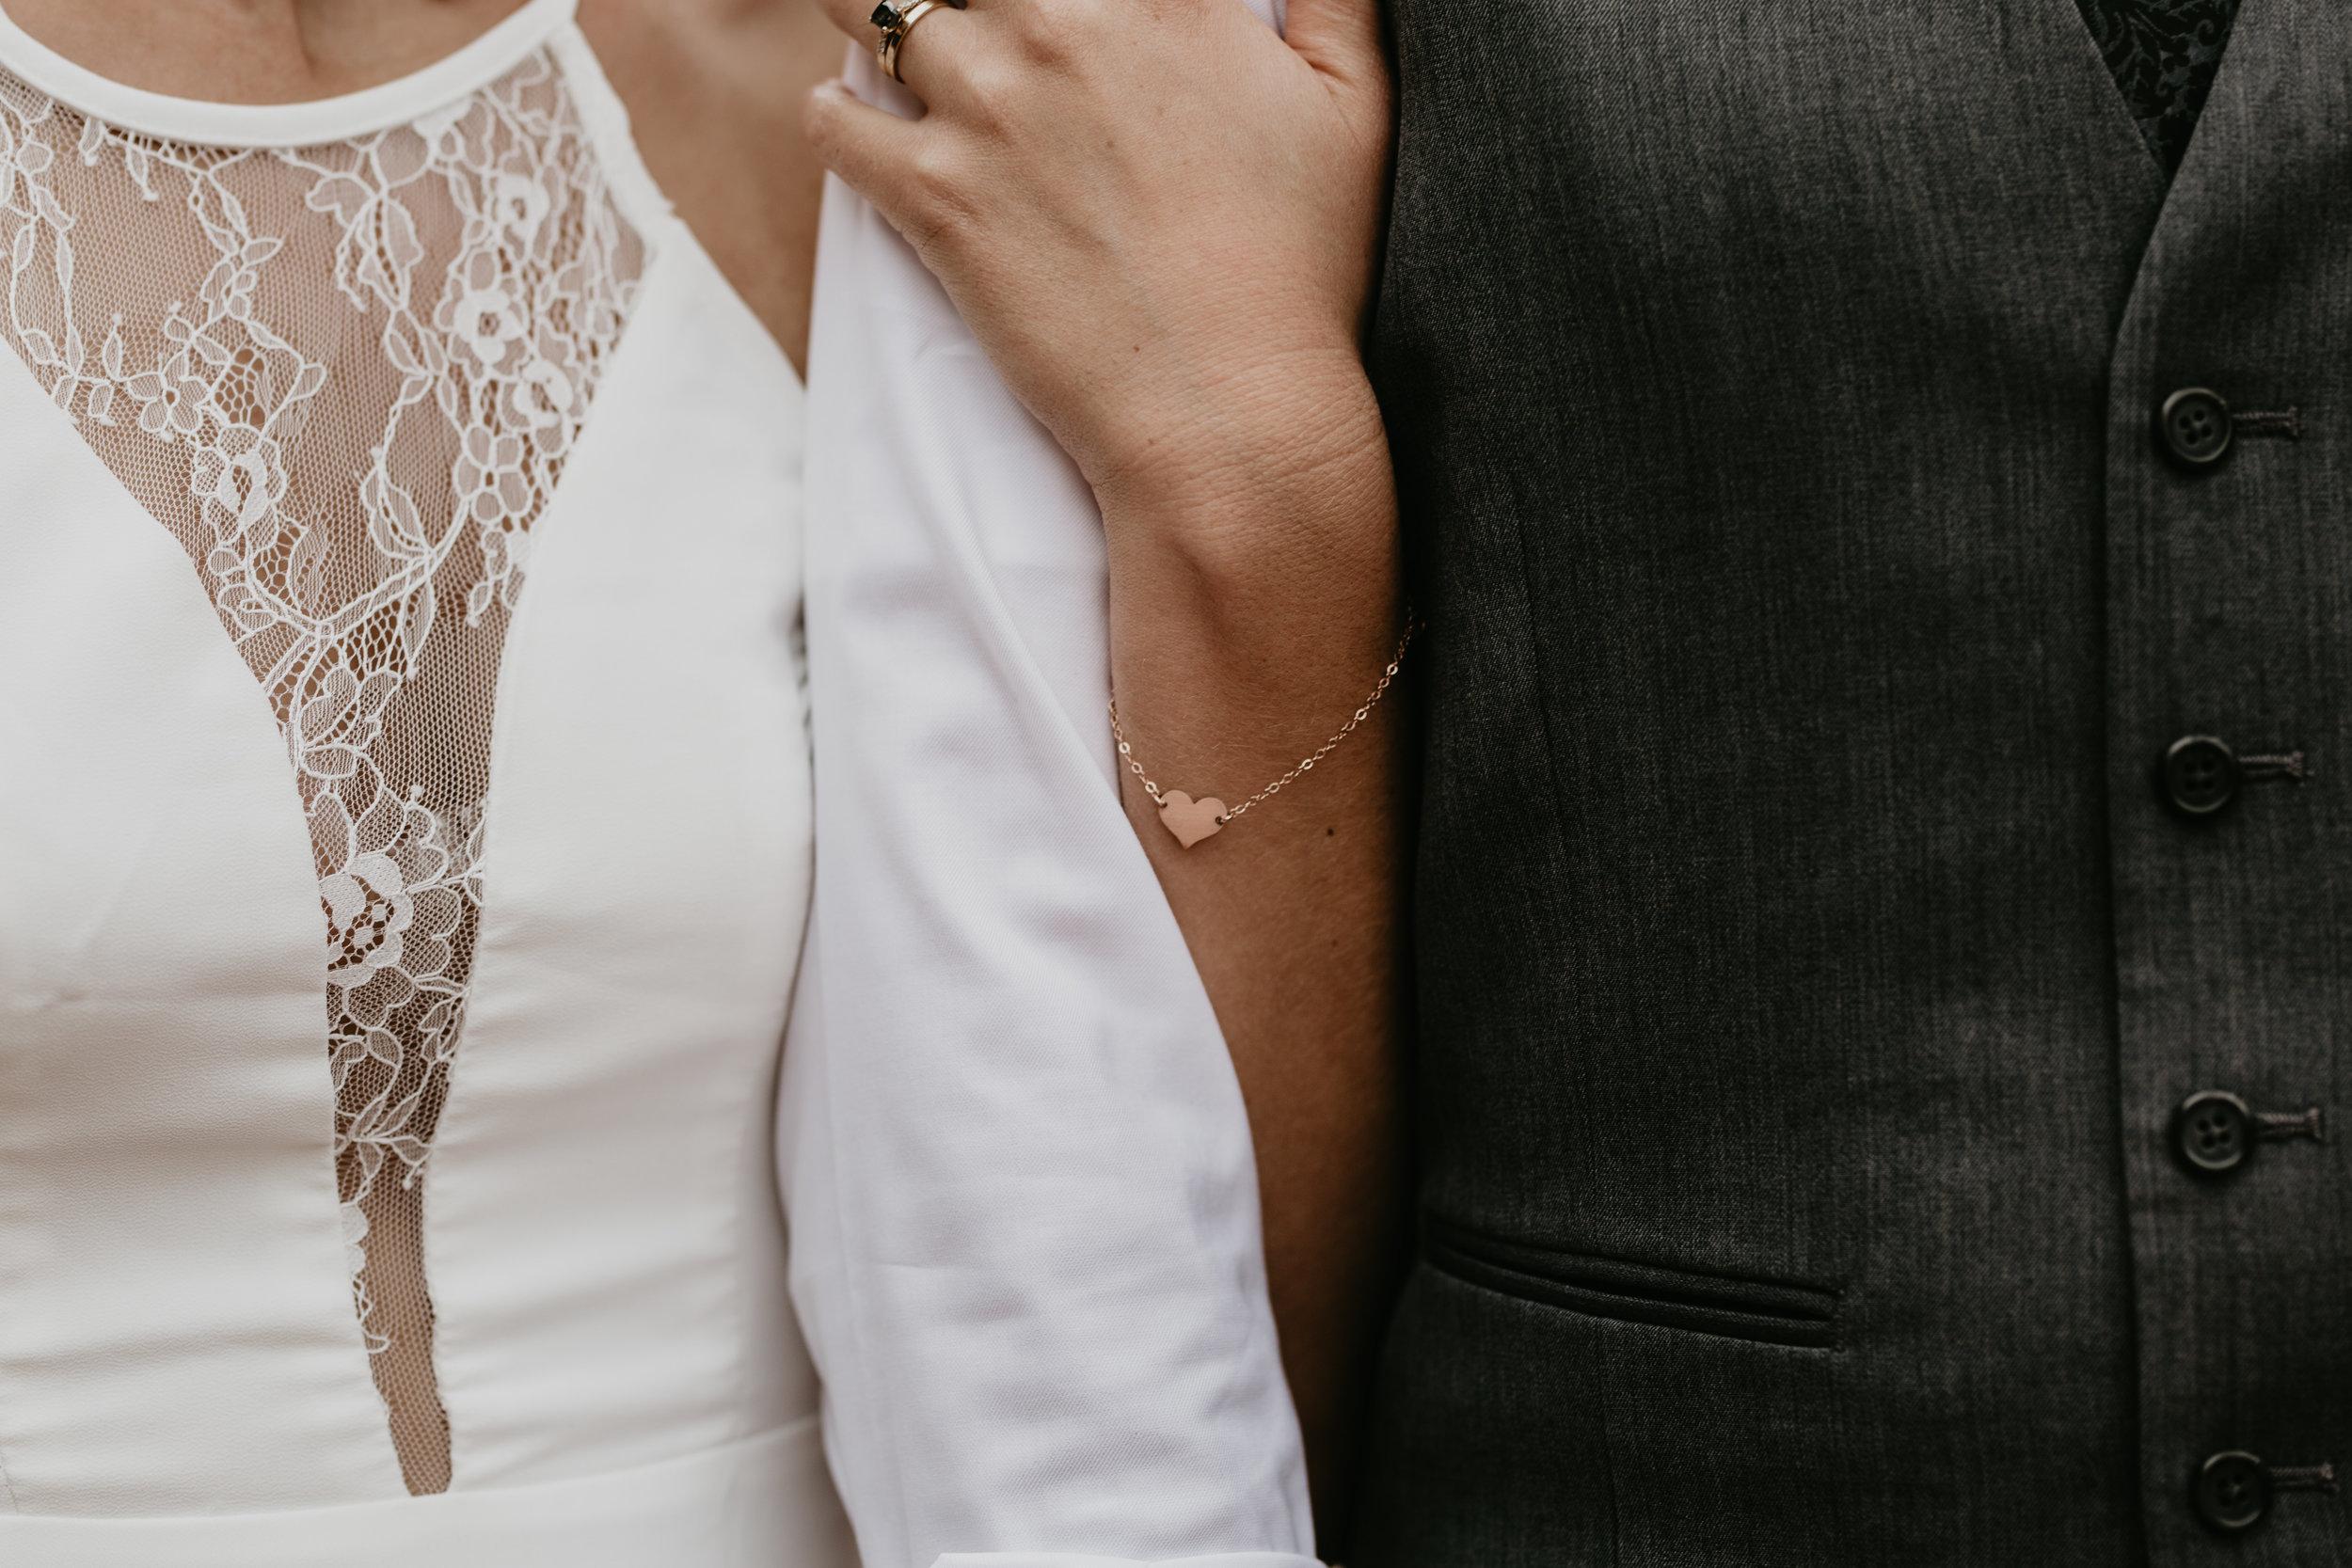 nicole-daacke-photography-sedona-arizona-destination-elopement-wedding-photographer-catherdral-rock-hiking-elopement-sedona-river-elopement-photos-desert-rock-wedding-photographer-laid-back-spontaneous-elopement-116.jpg